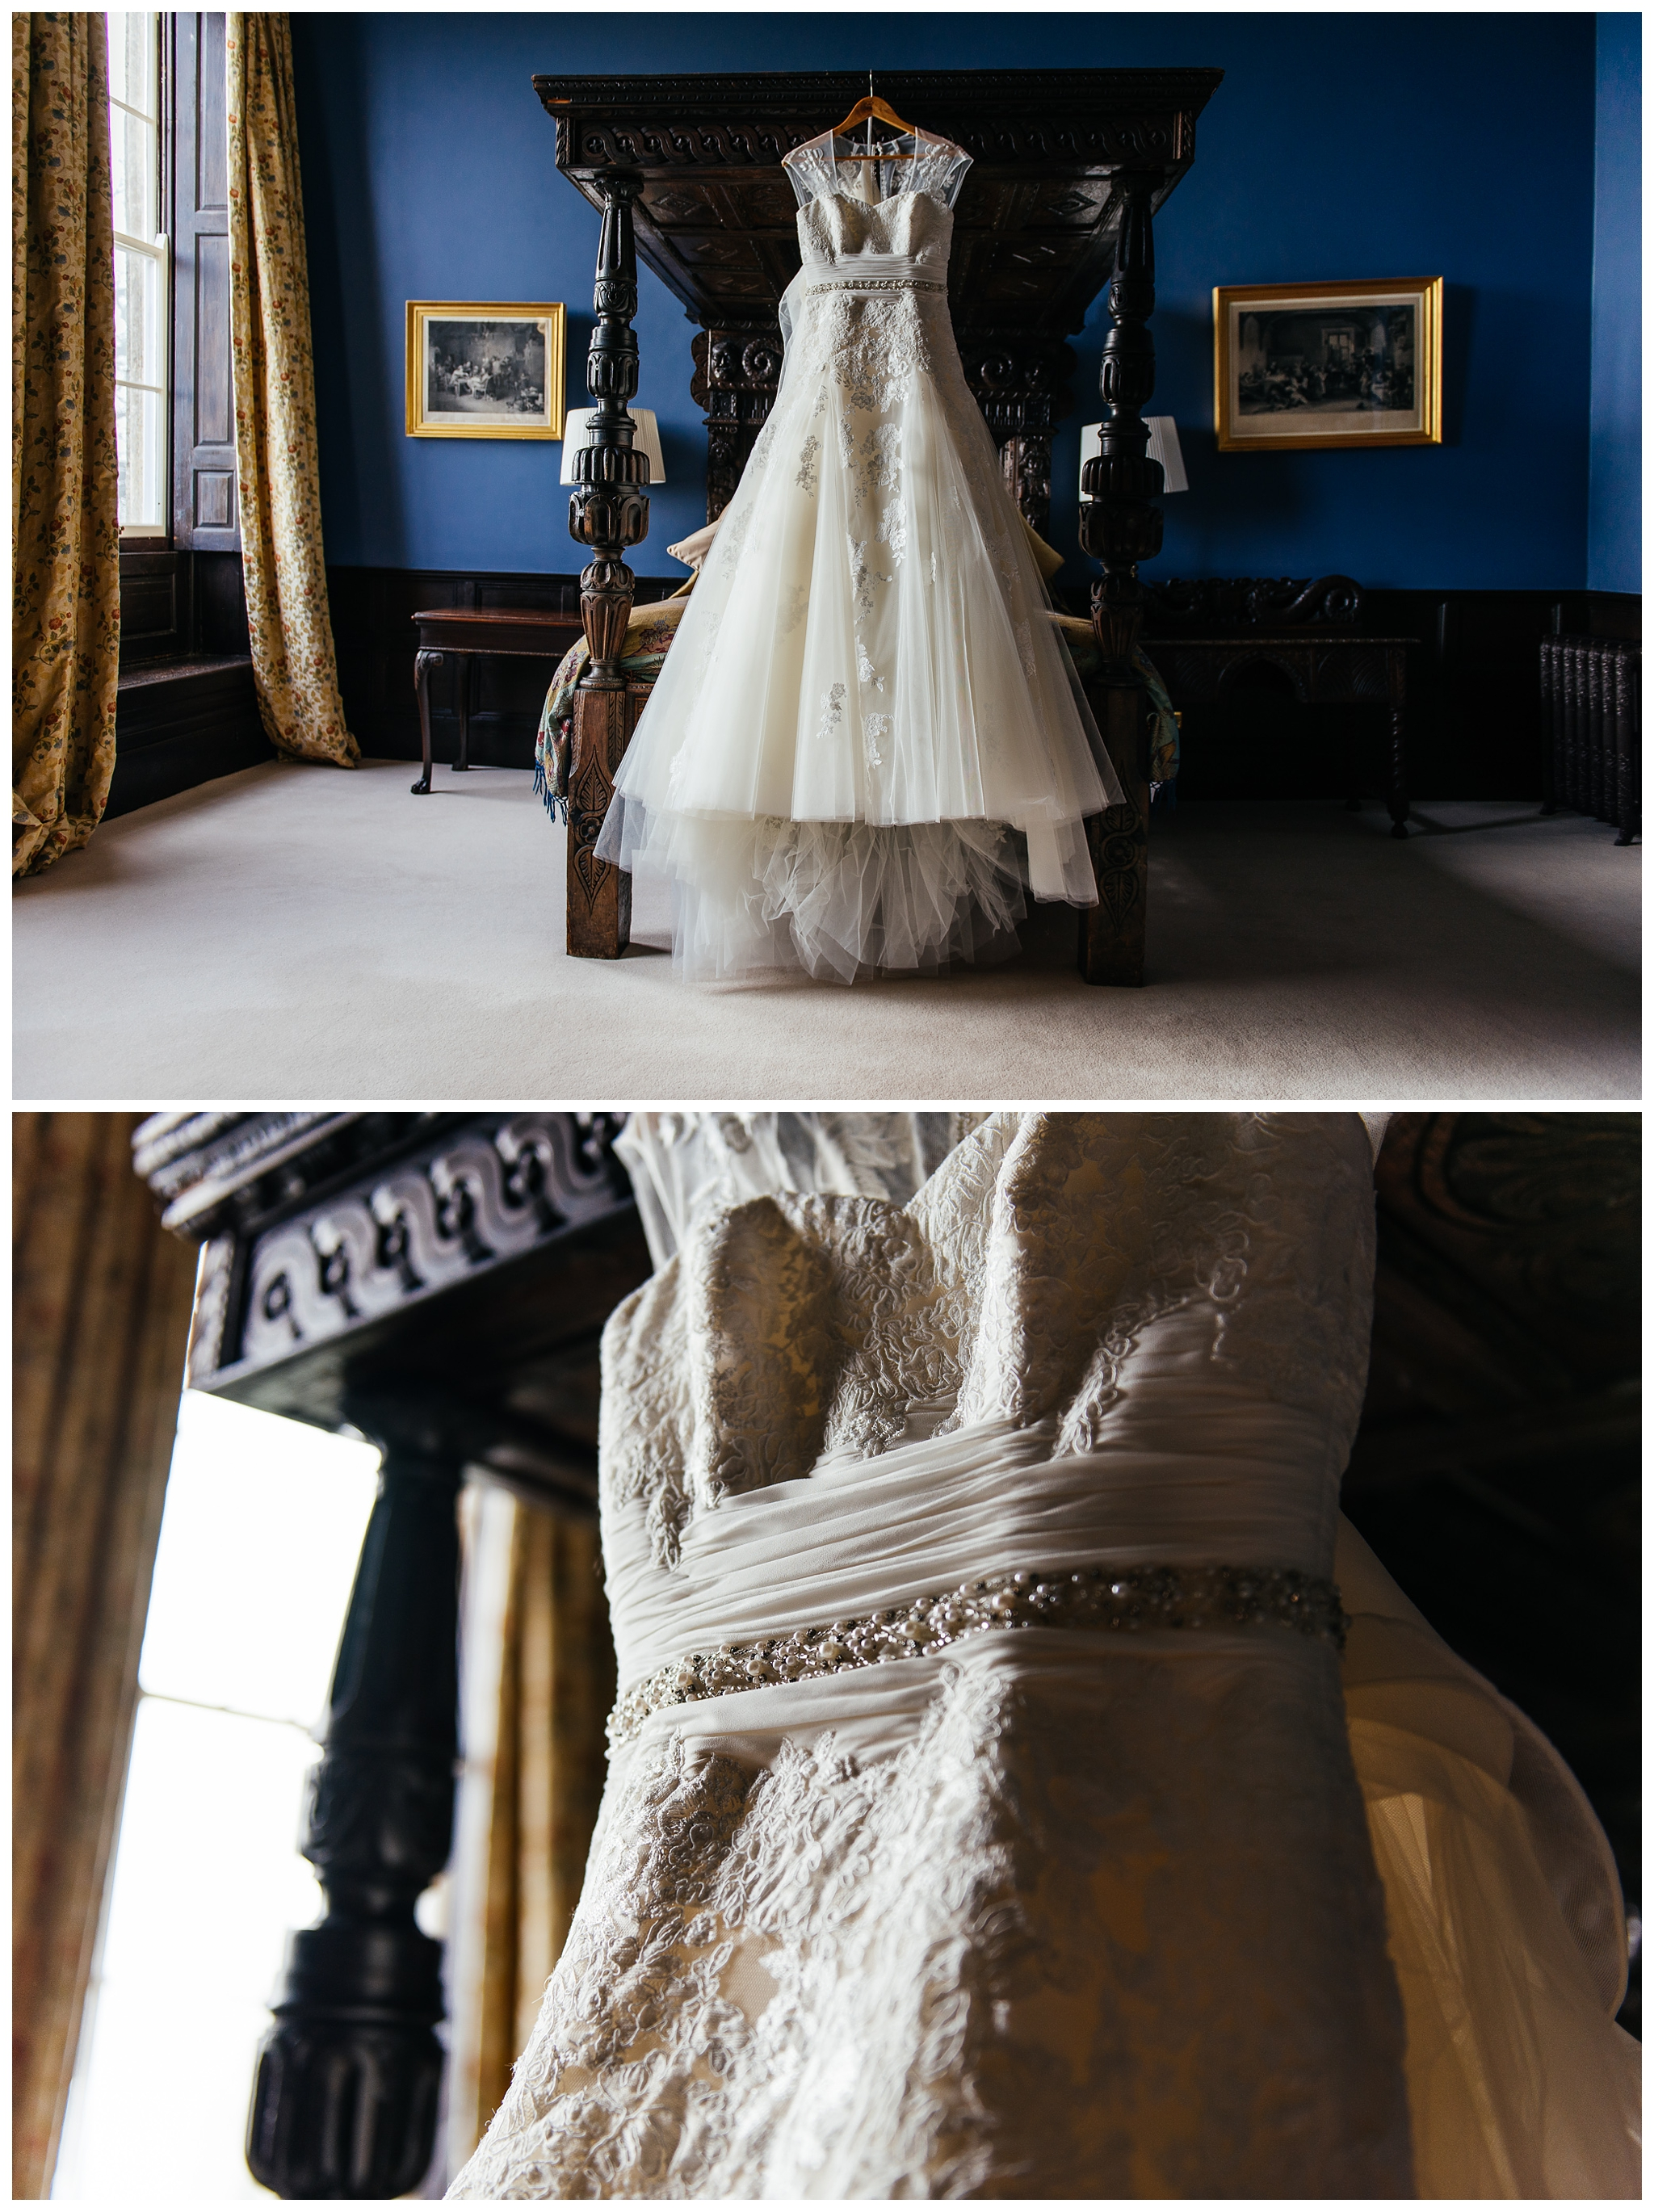 Emma&Paul-Elmore-Court-Winter-Wedding-Nikki-Cooper-Photography_0018.jpg